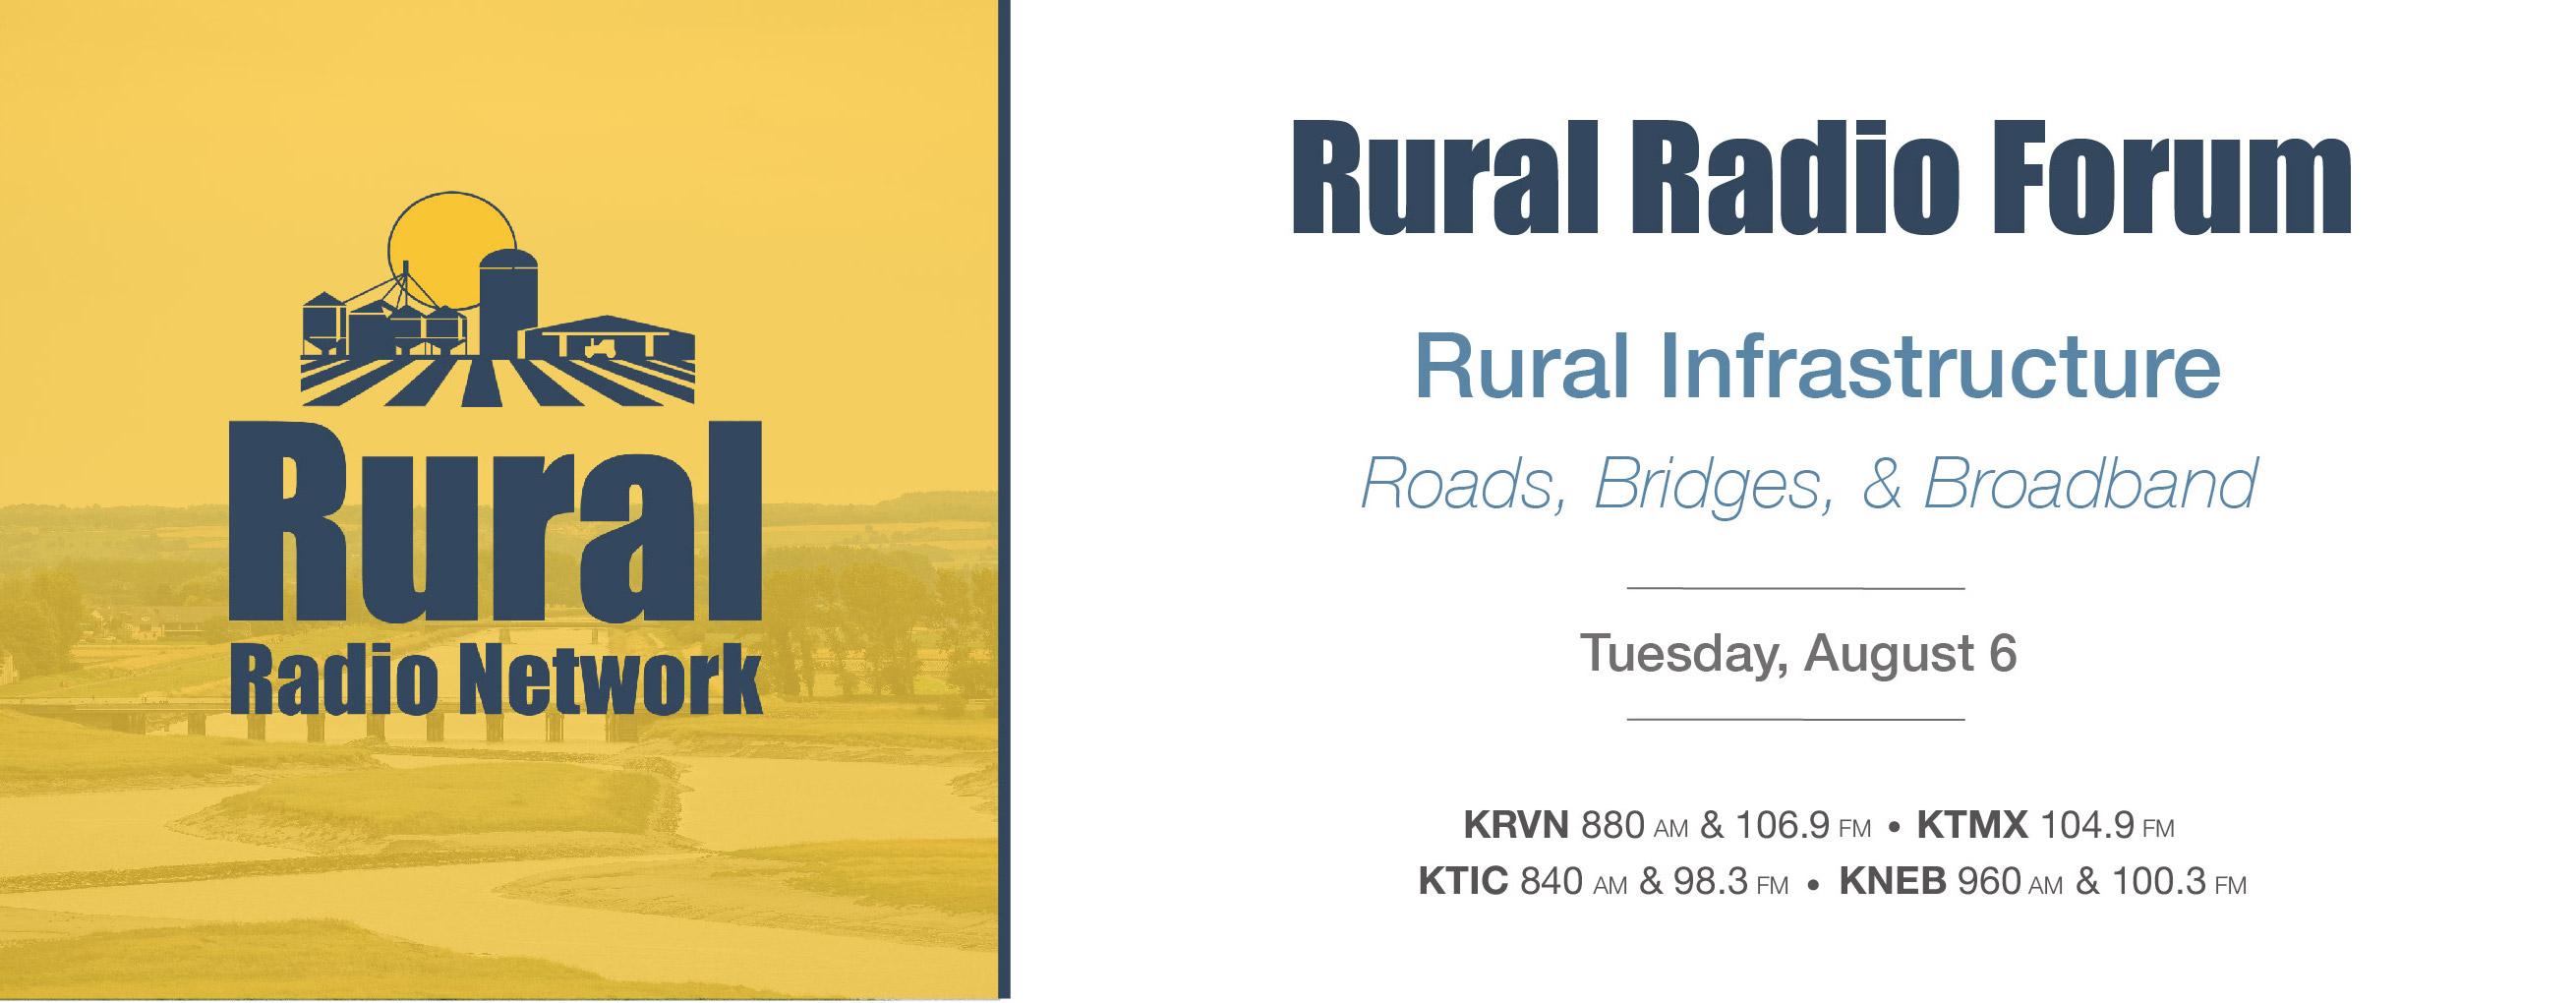 Rural Radio Forum | KRVN Radio